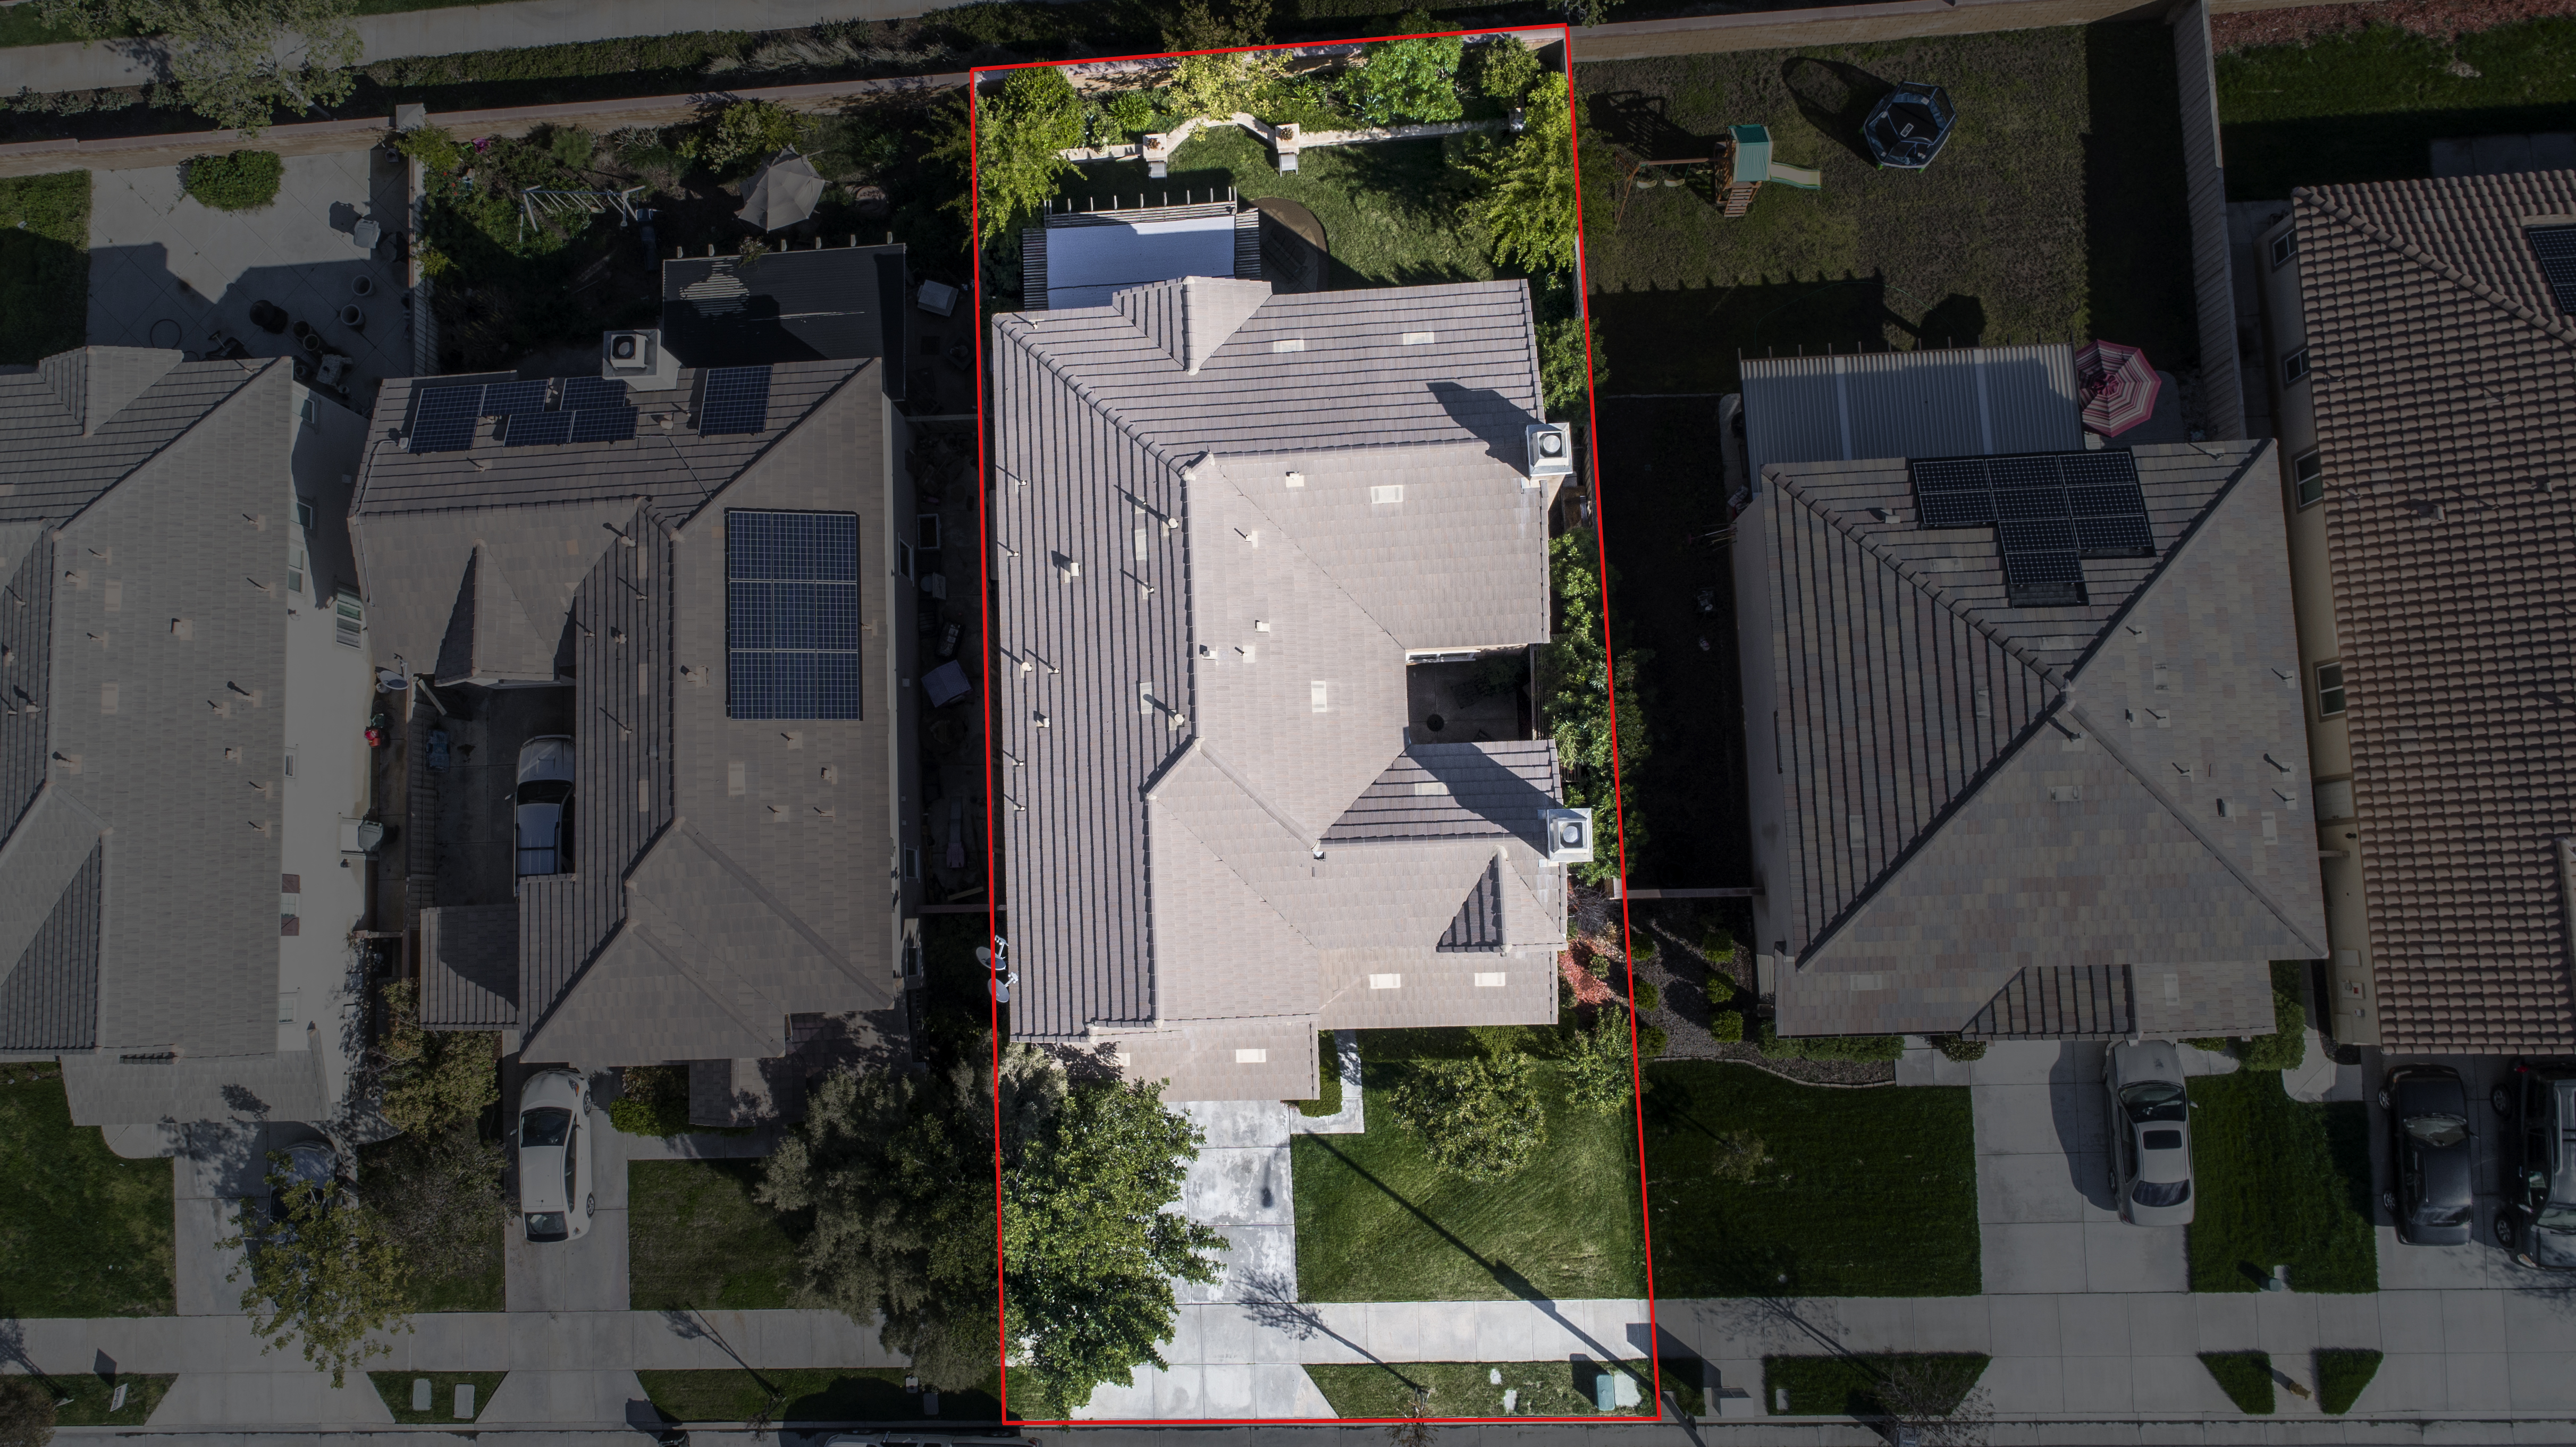 Chaparossa_Drone_Property_View